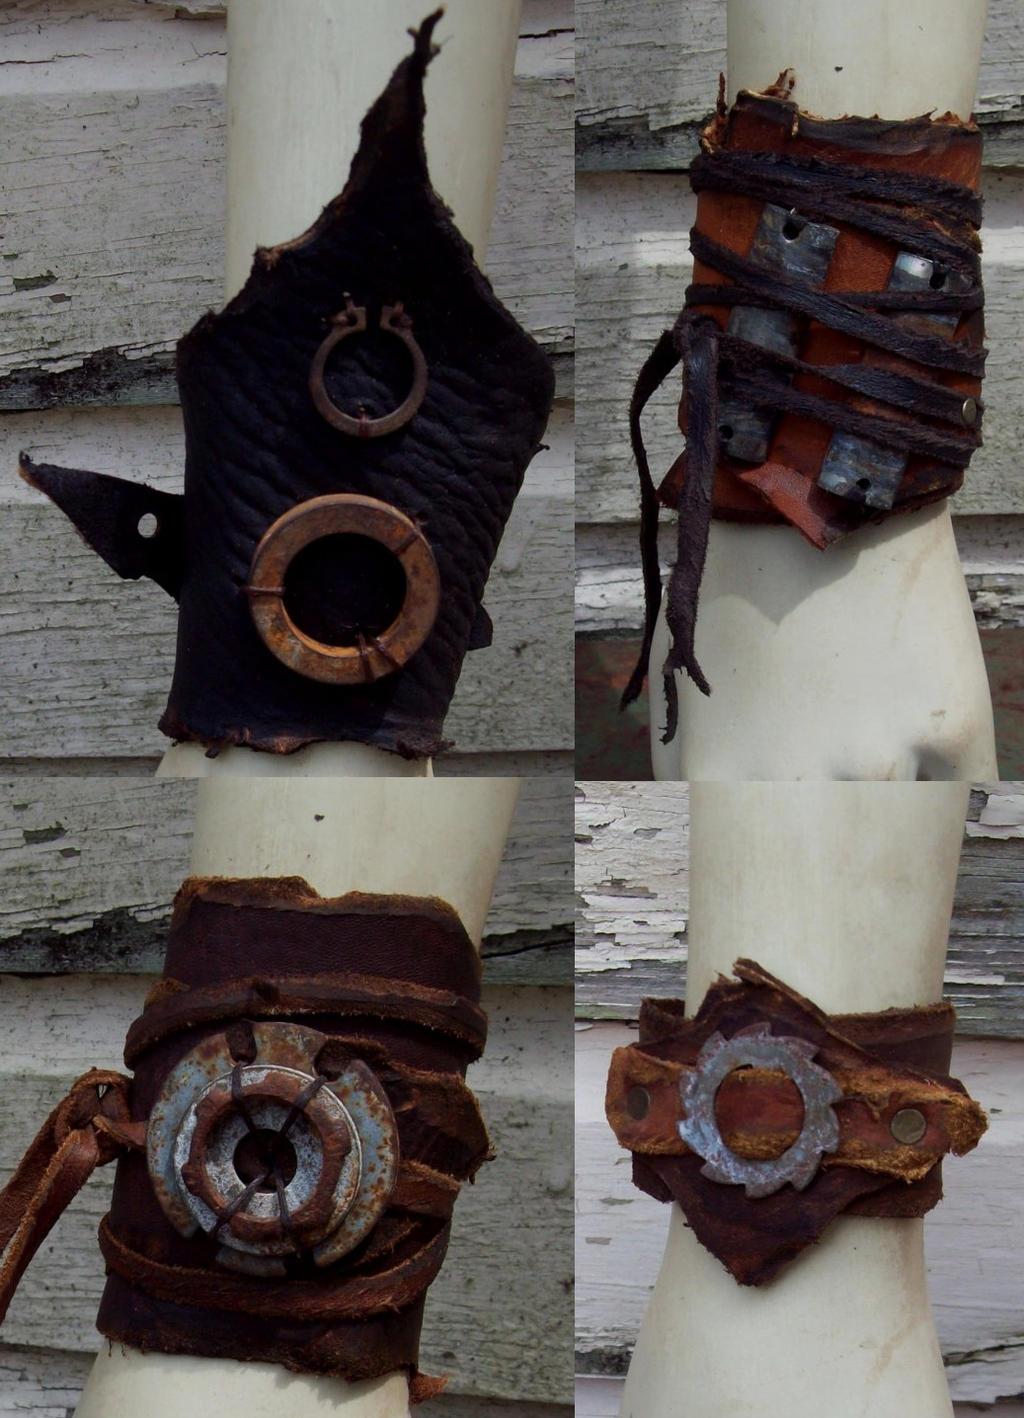 Scavenged Bracelets by Xavietta